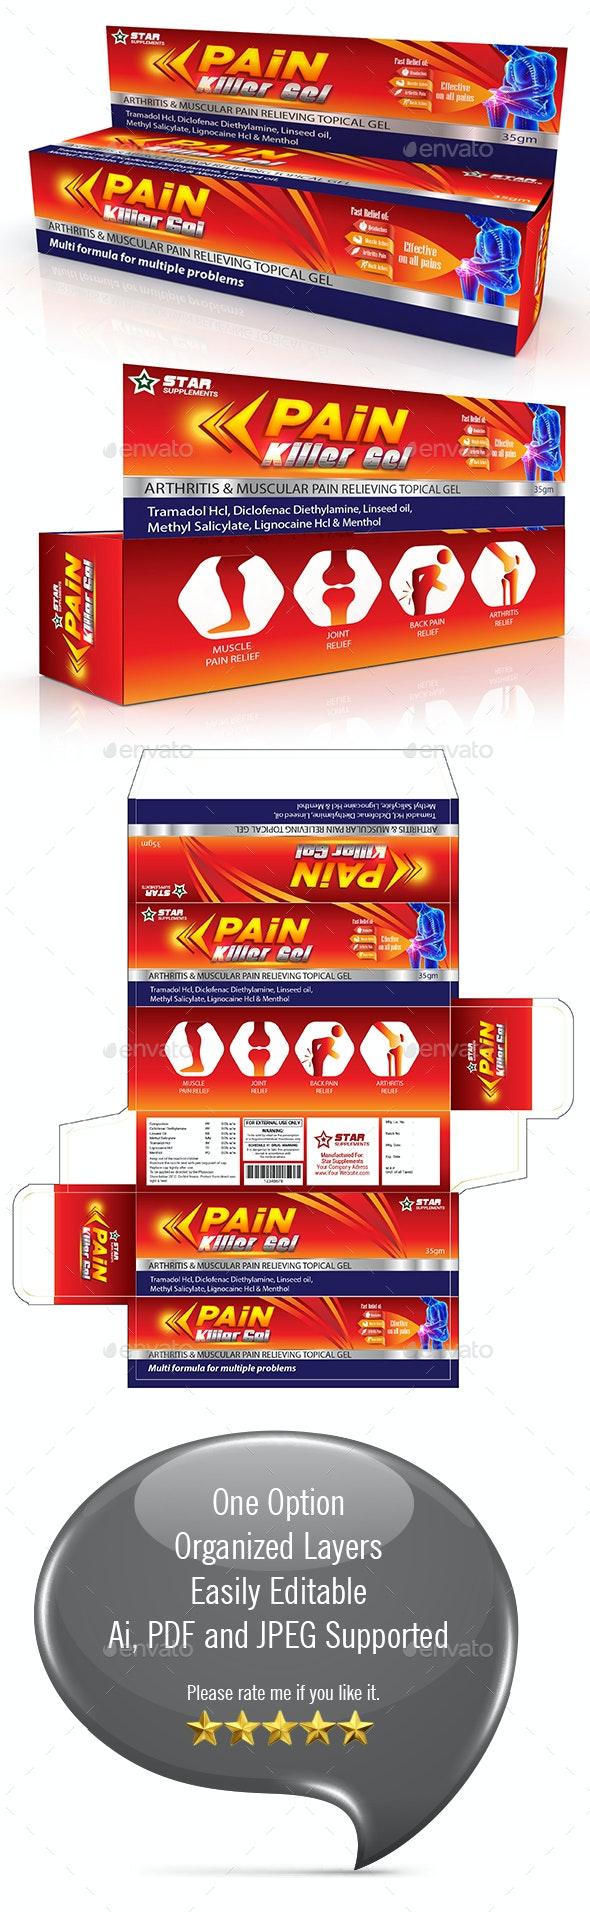 Pain Relief Gel Packaging Template - Packaging Print Templates